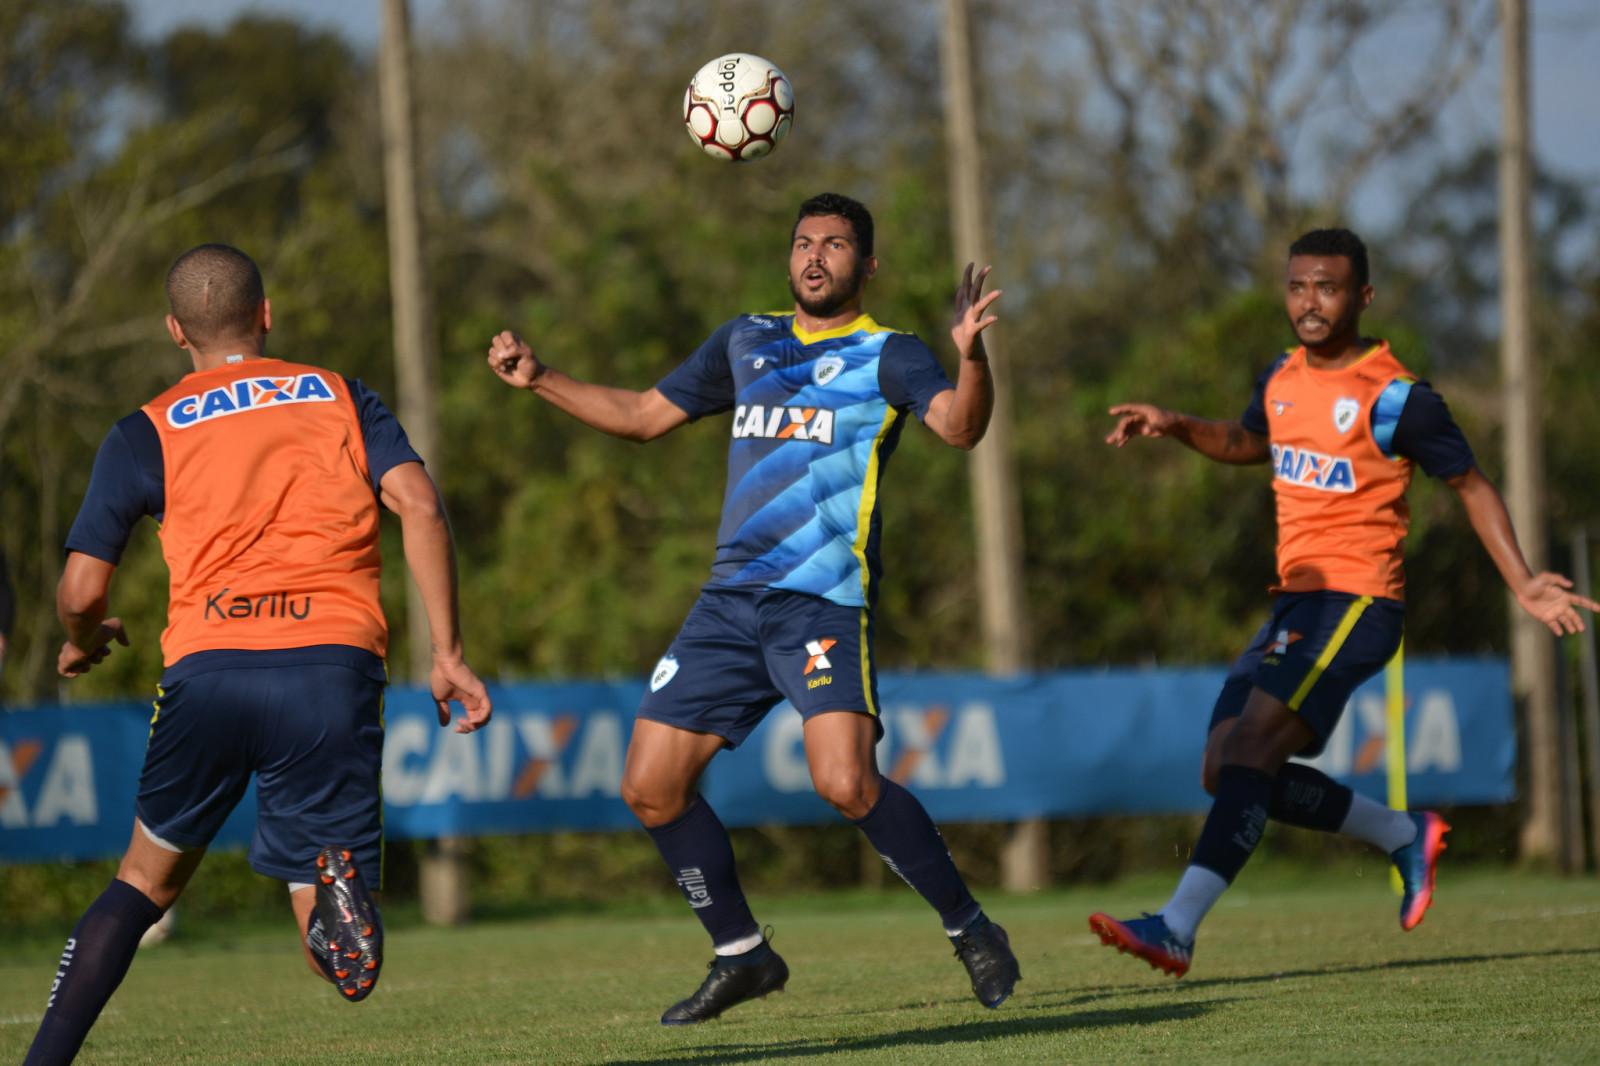 Londrina Carlos Henrique Foto Gustavo Oliveira Londrina Esporte Clube